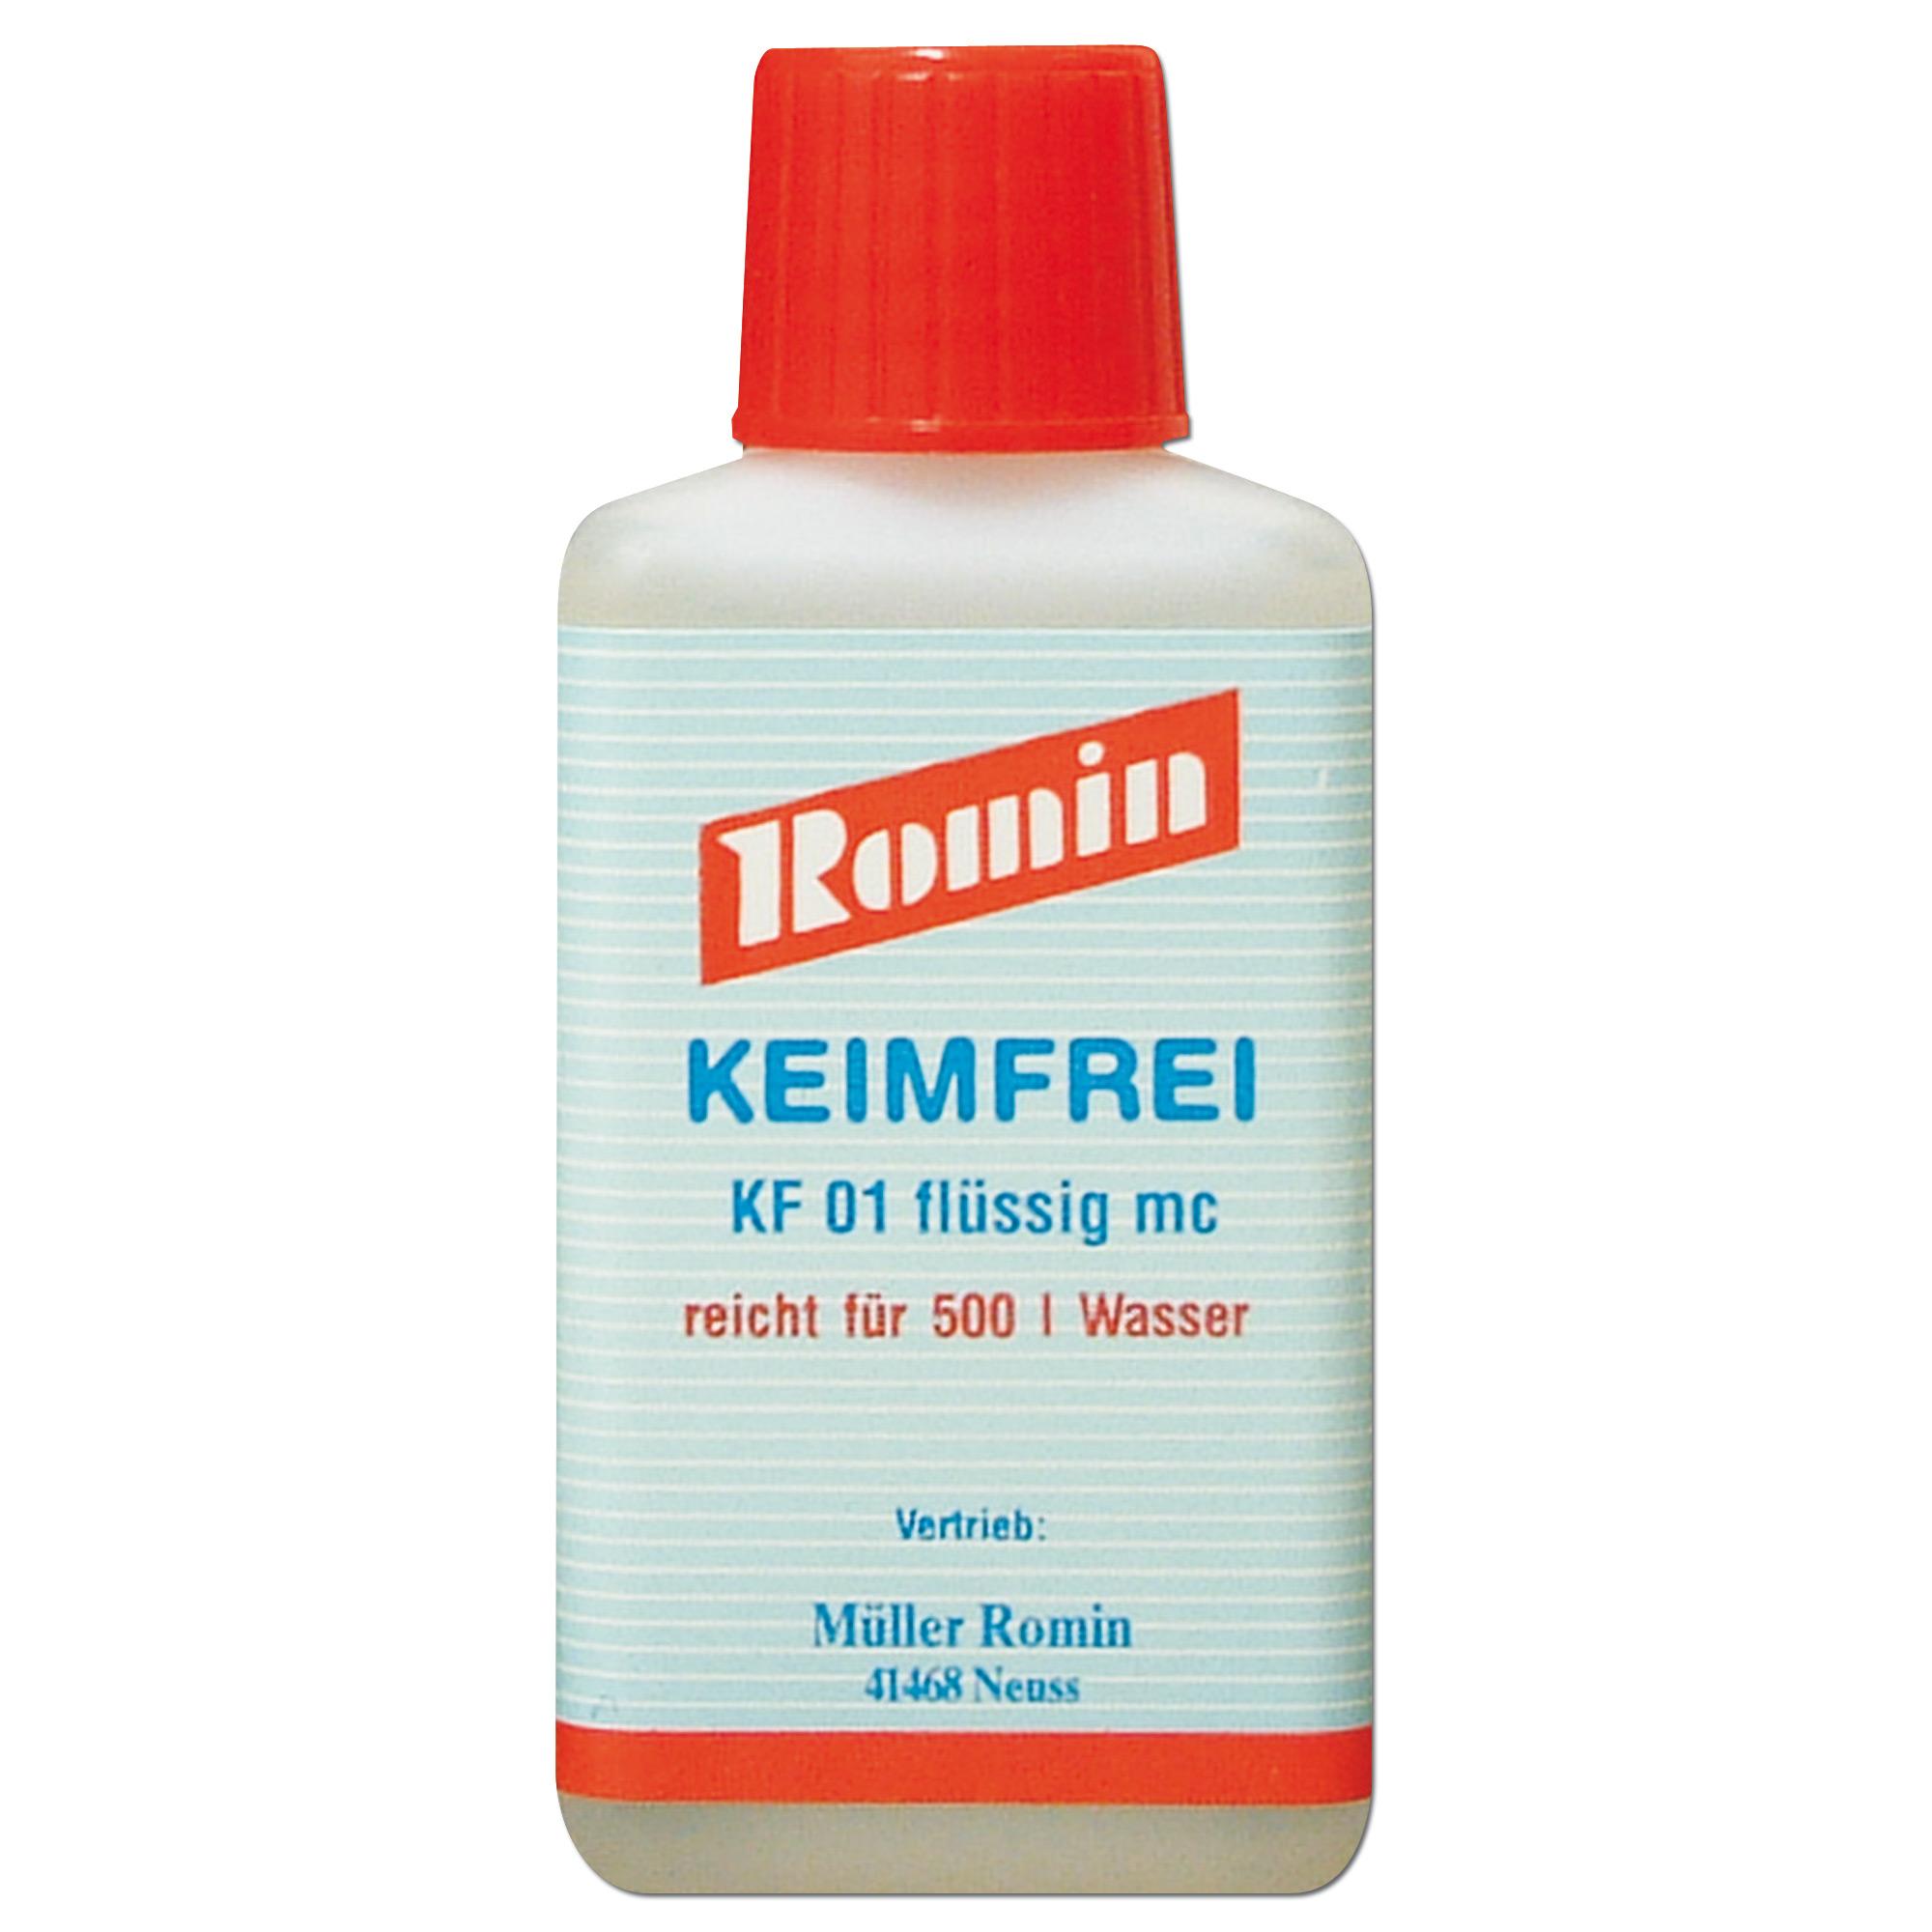 Romin flüssig mit Chlor KF01 mc